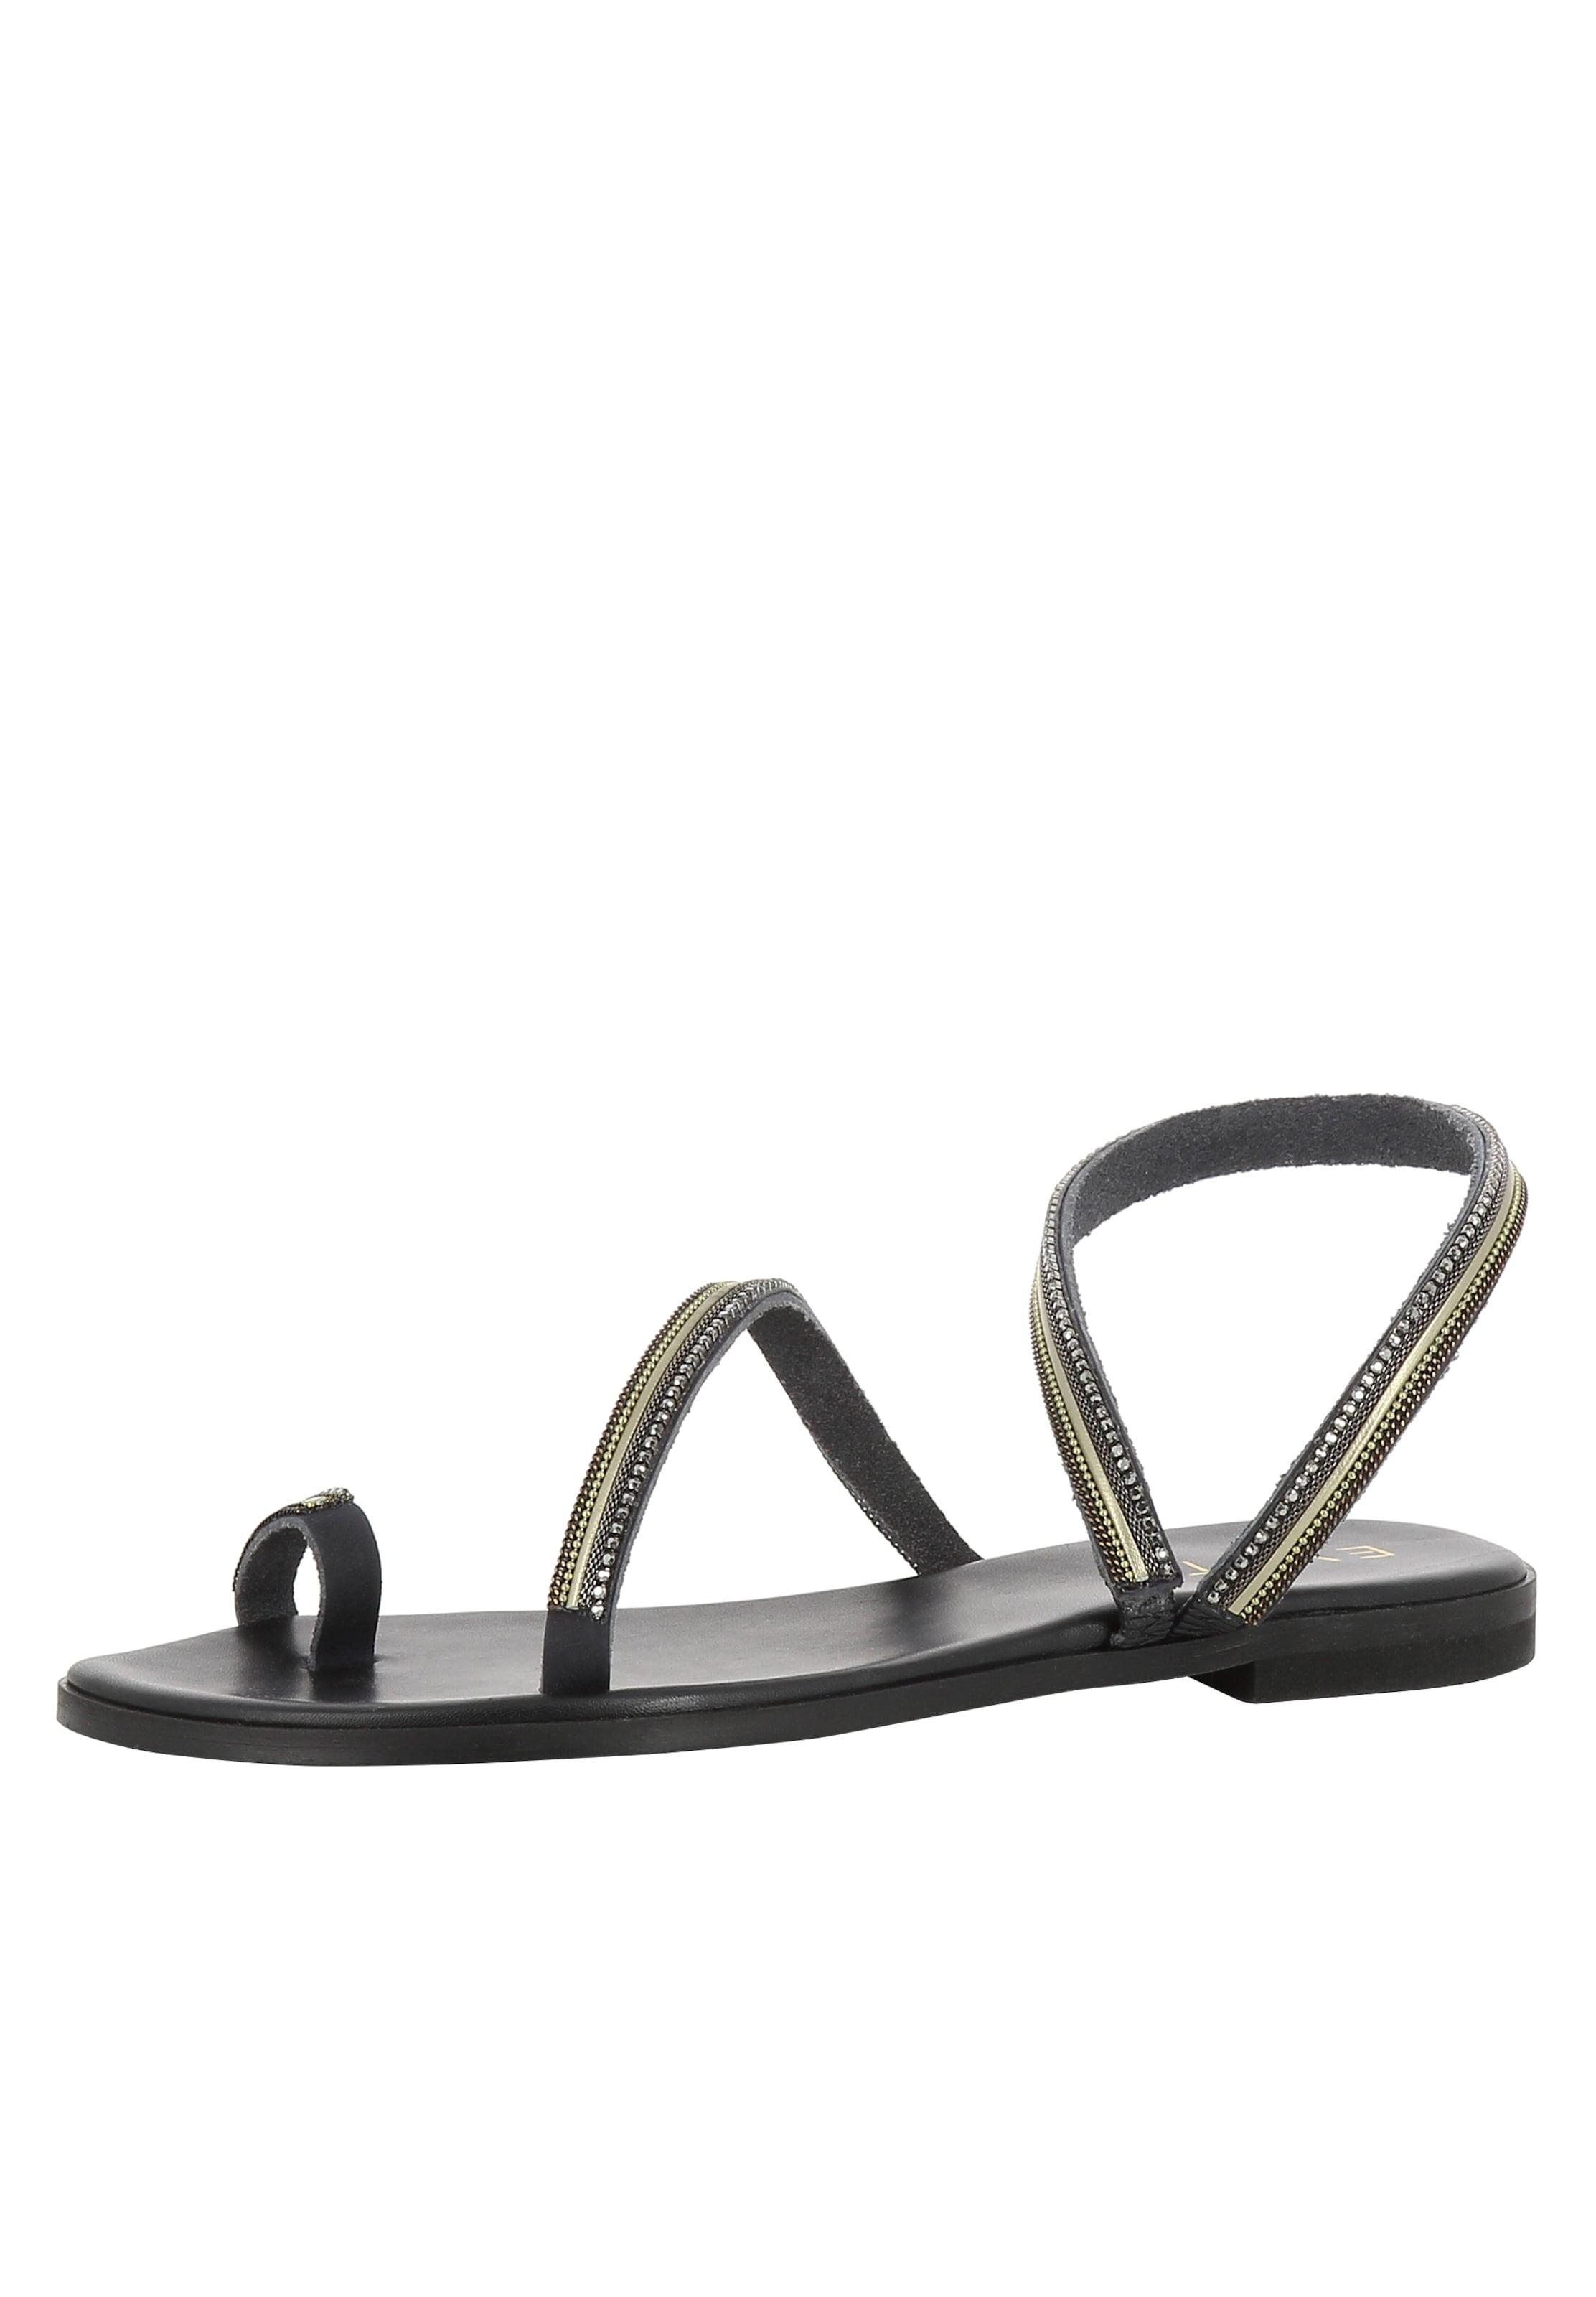 EVITA Sandale OLIMPIA Verschleißfeste billige Schuhe